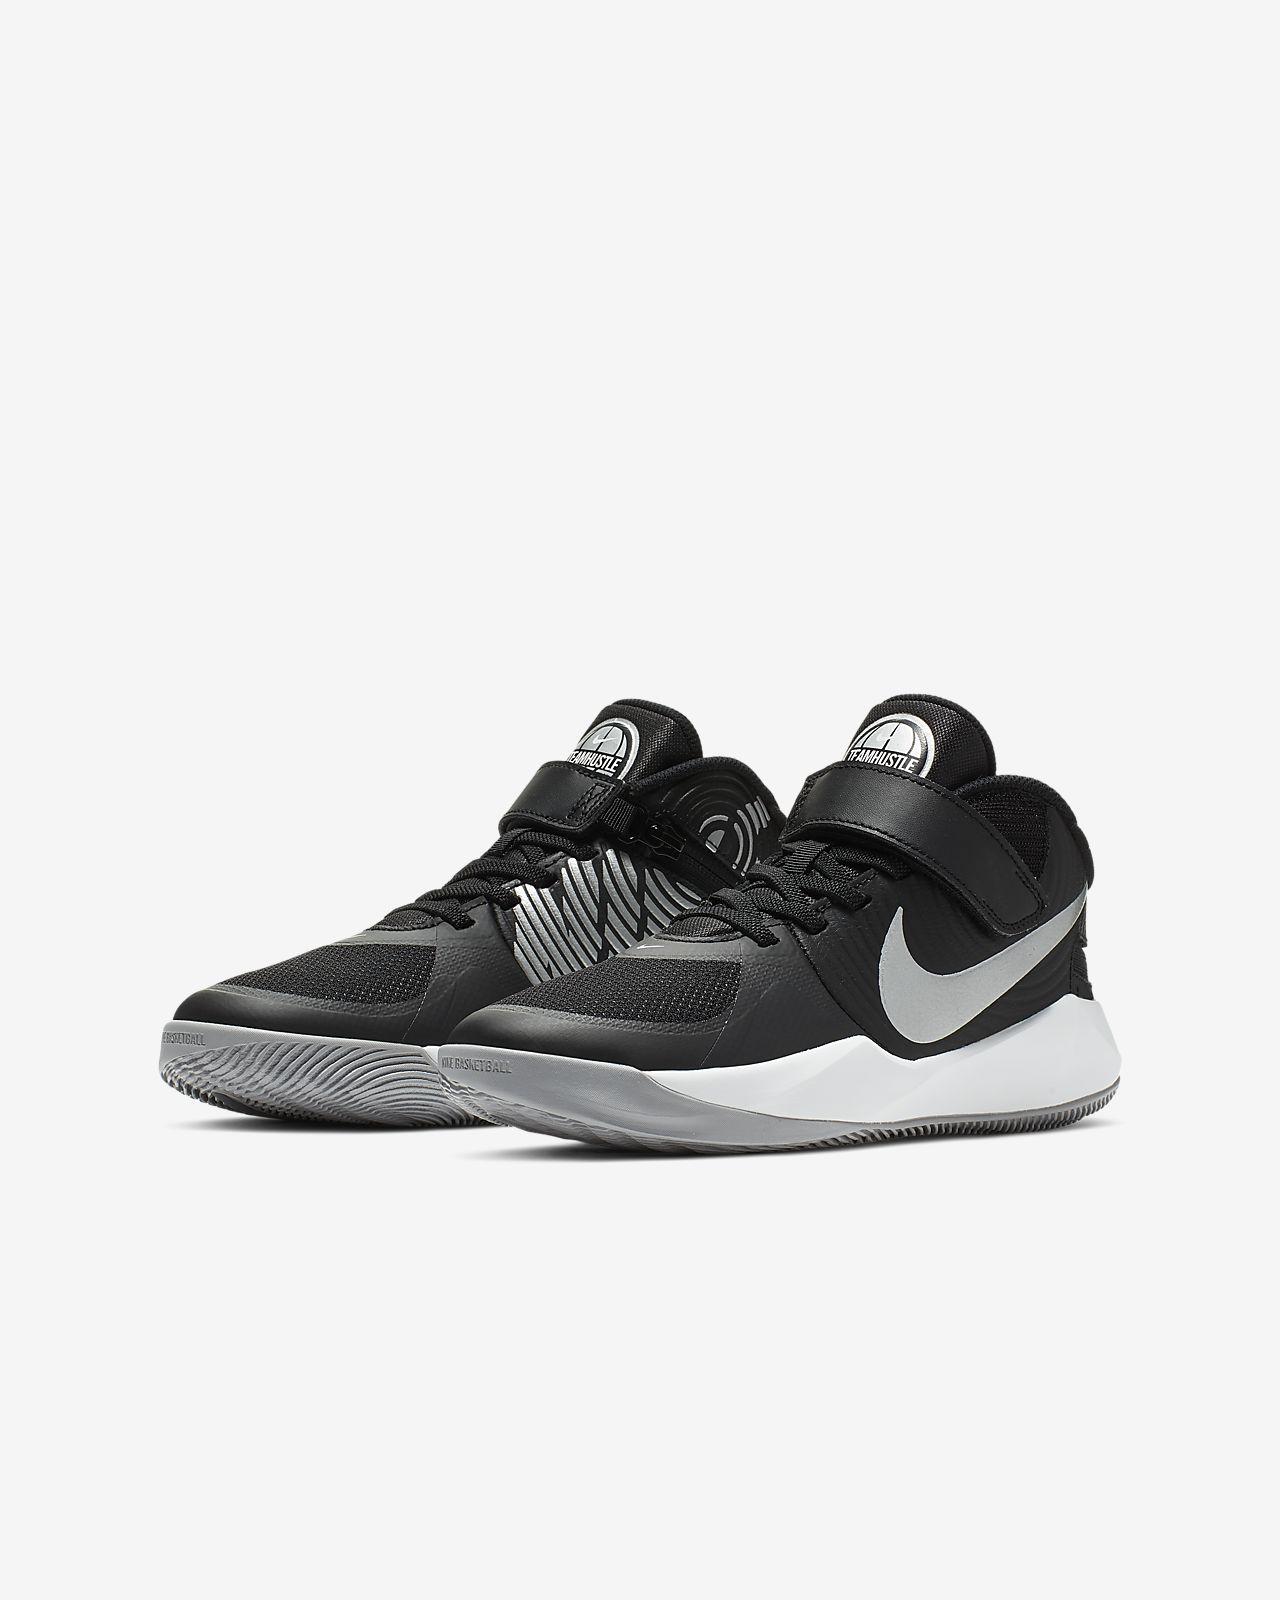 4b0ab3129187 Nike Team Hustle D 9 Flyease Big Kids  Basketball Shoe. Nike.com